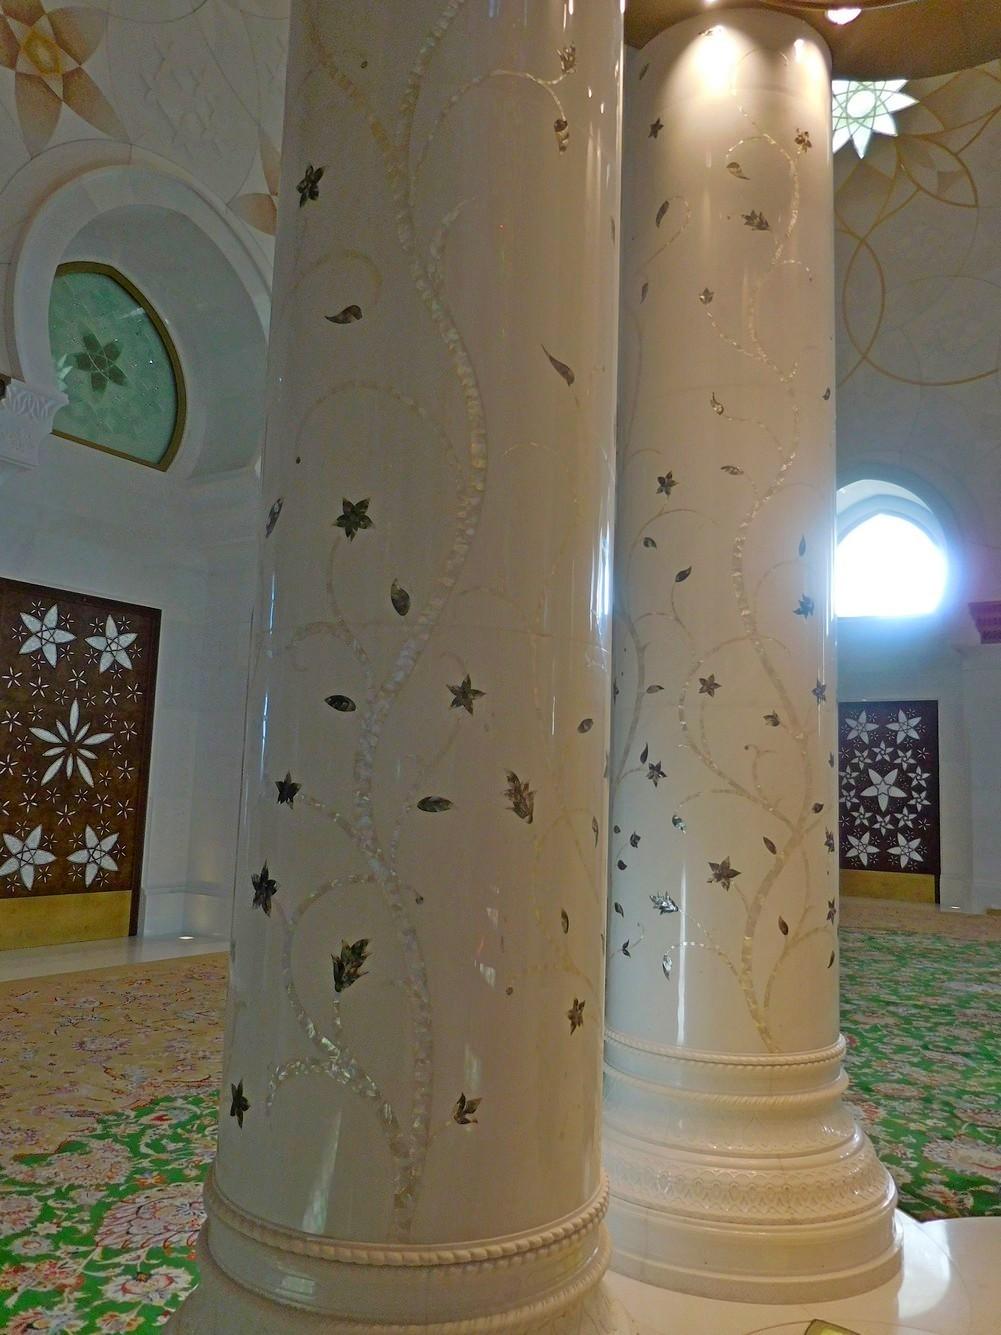 Sheikh Zayed Grand Mosque, Abu Dhabi, UAE, Splendid Columns Inside the Mosque